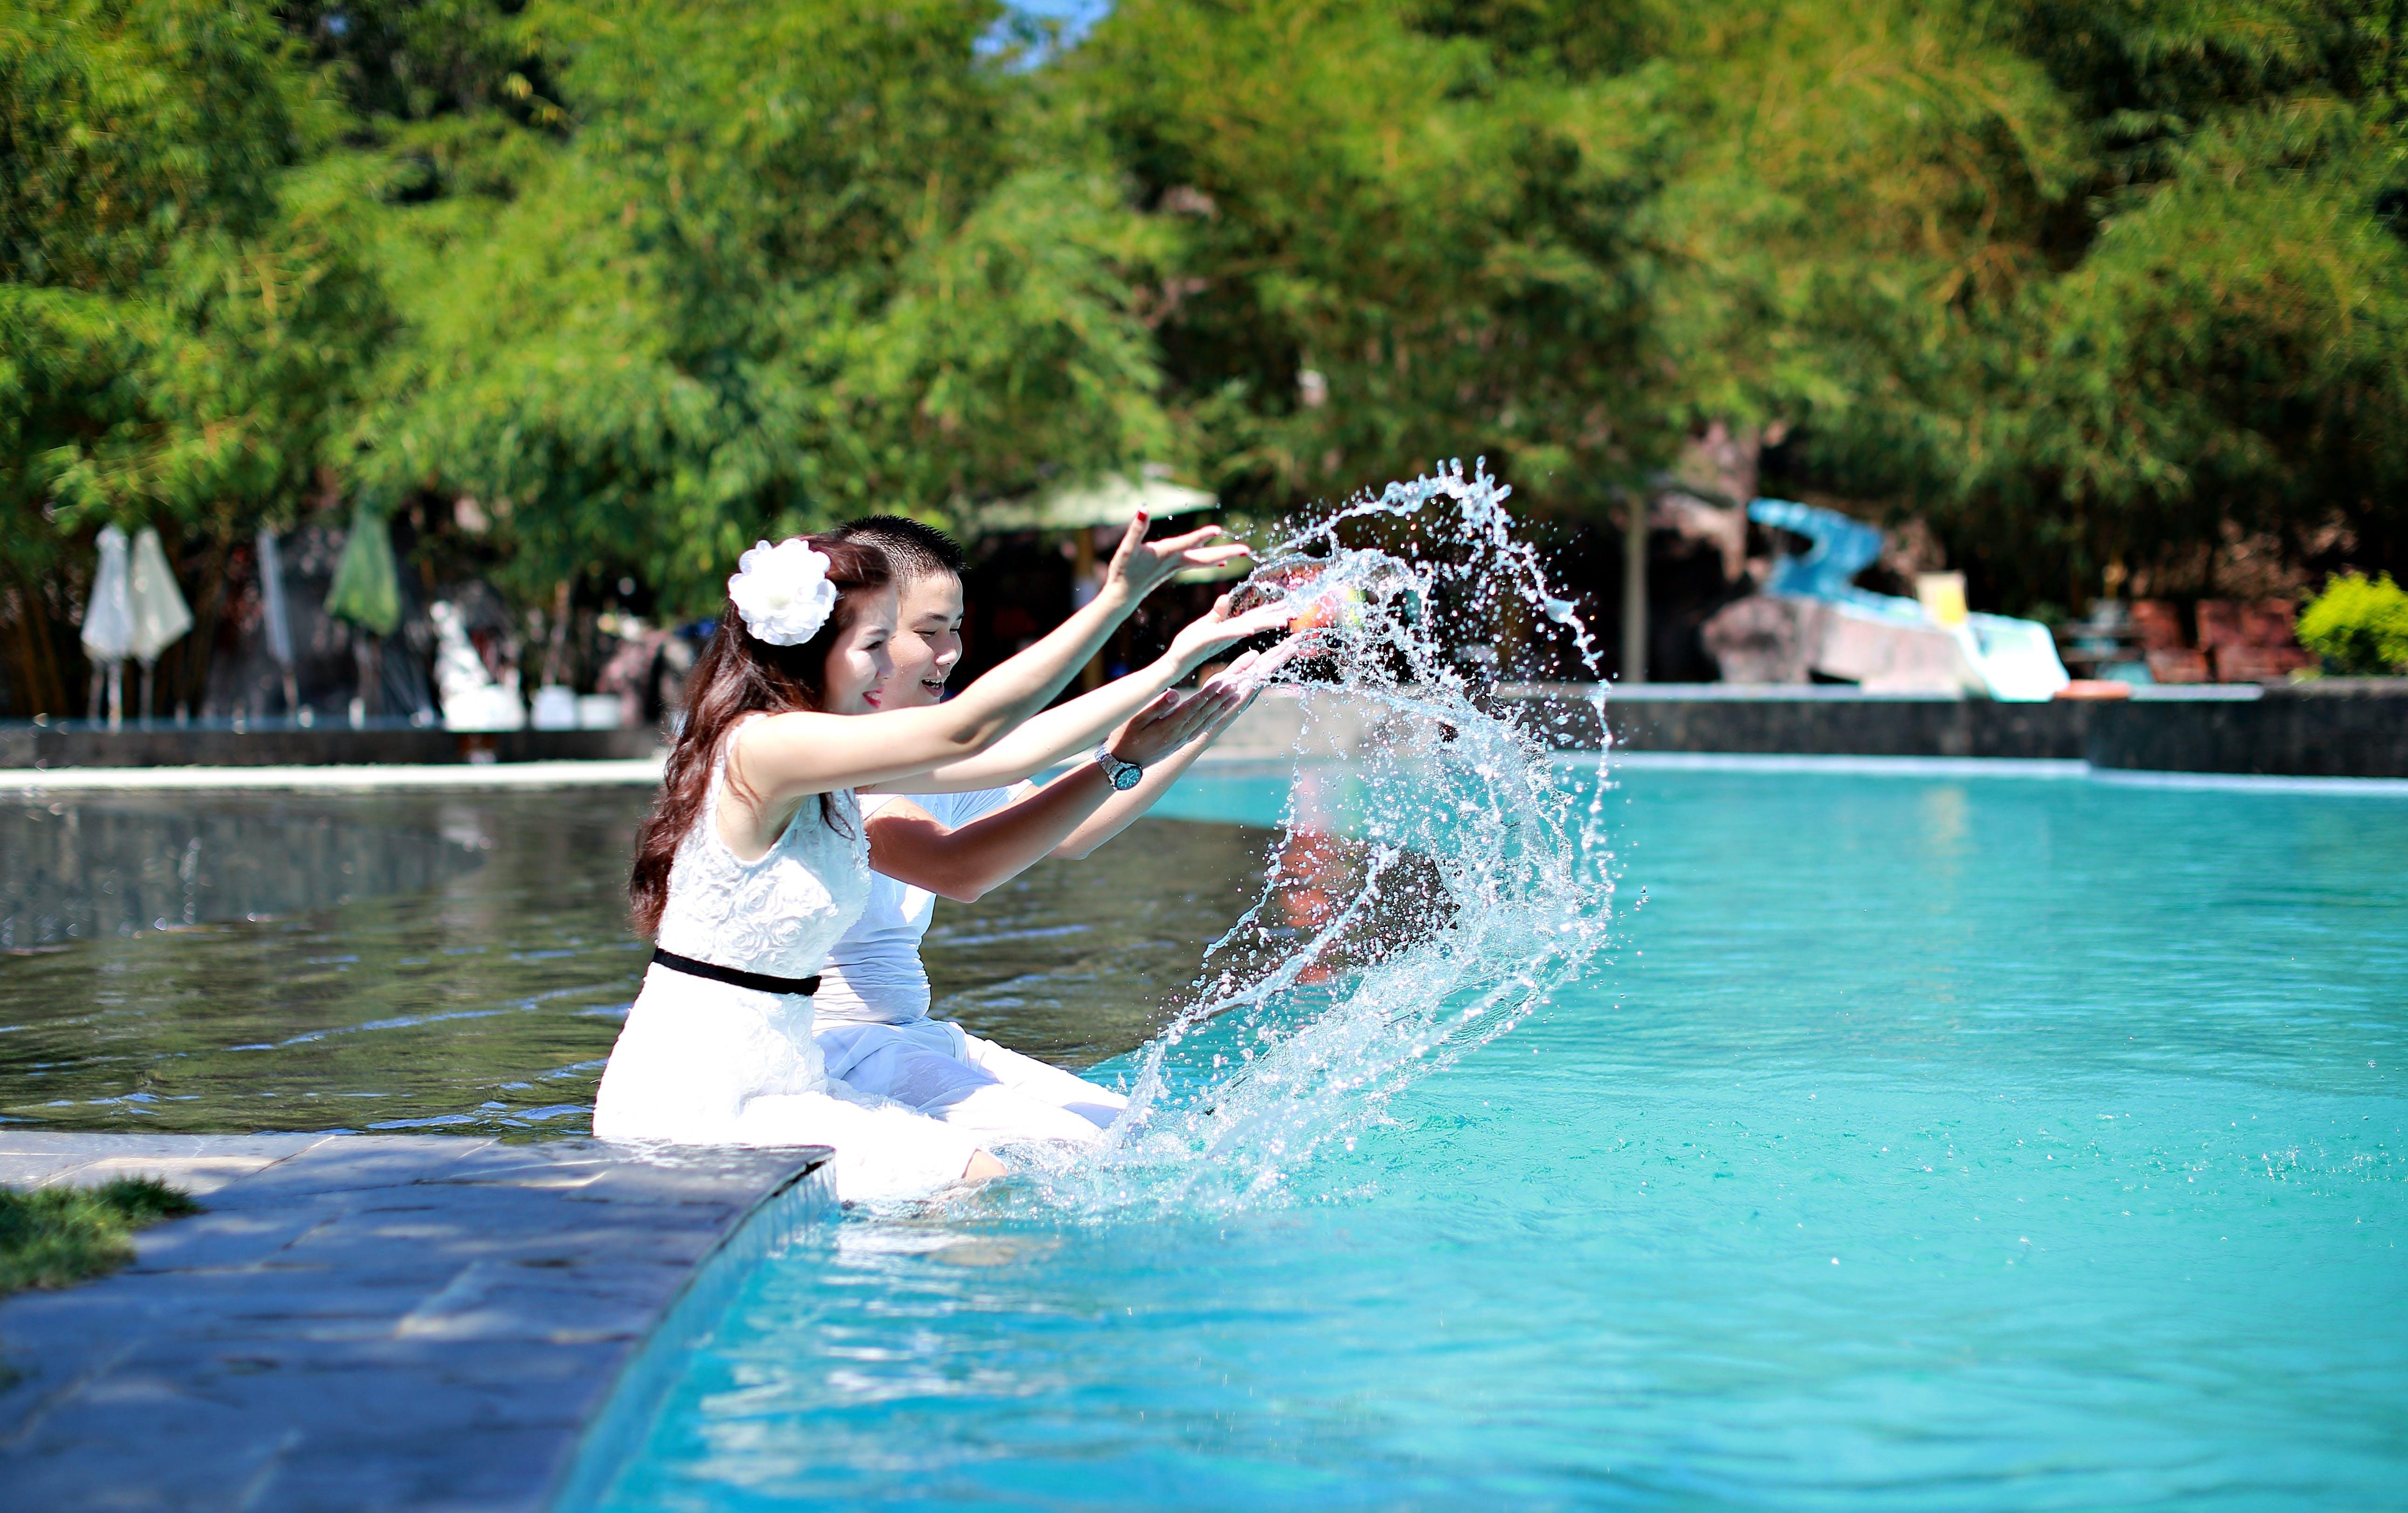 Woman and Man Sitting on Swimming Pool While Playing Water Splash